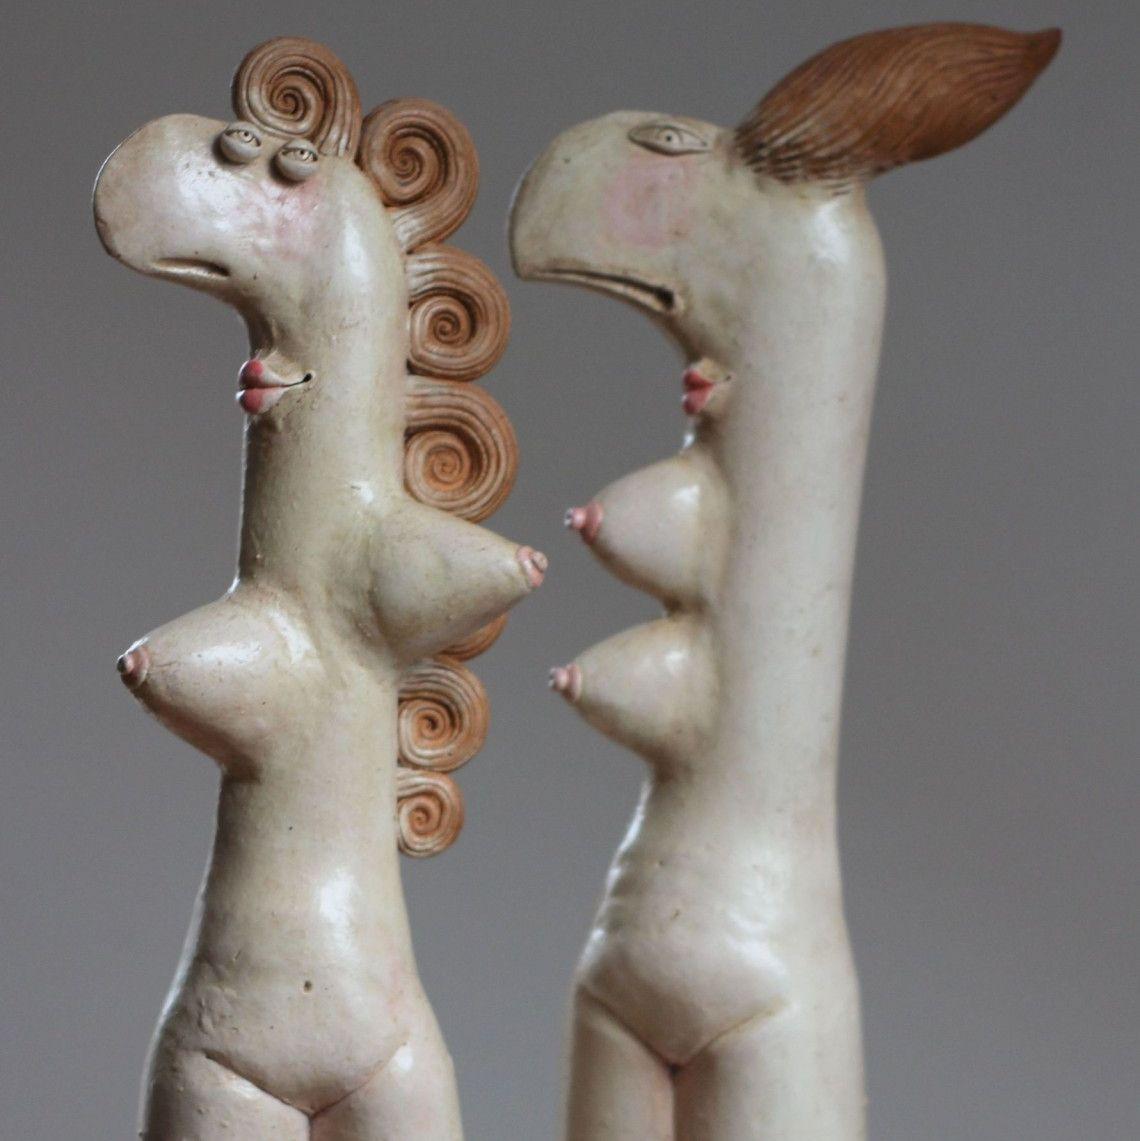 Kochanki, ceramika, 2012, Alex Johanson